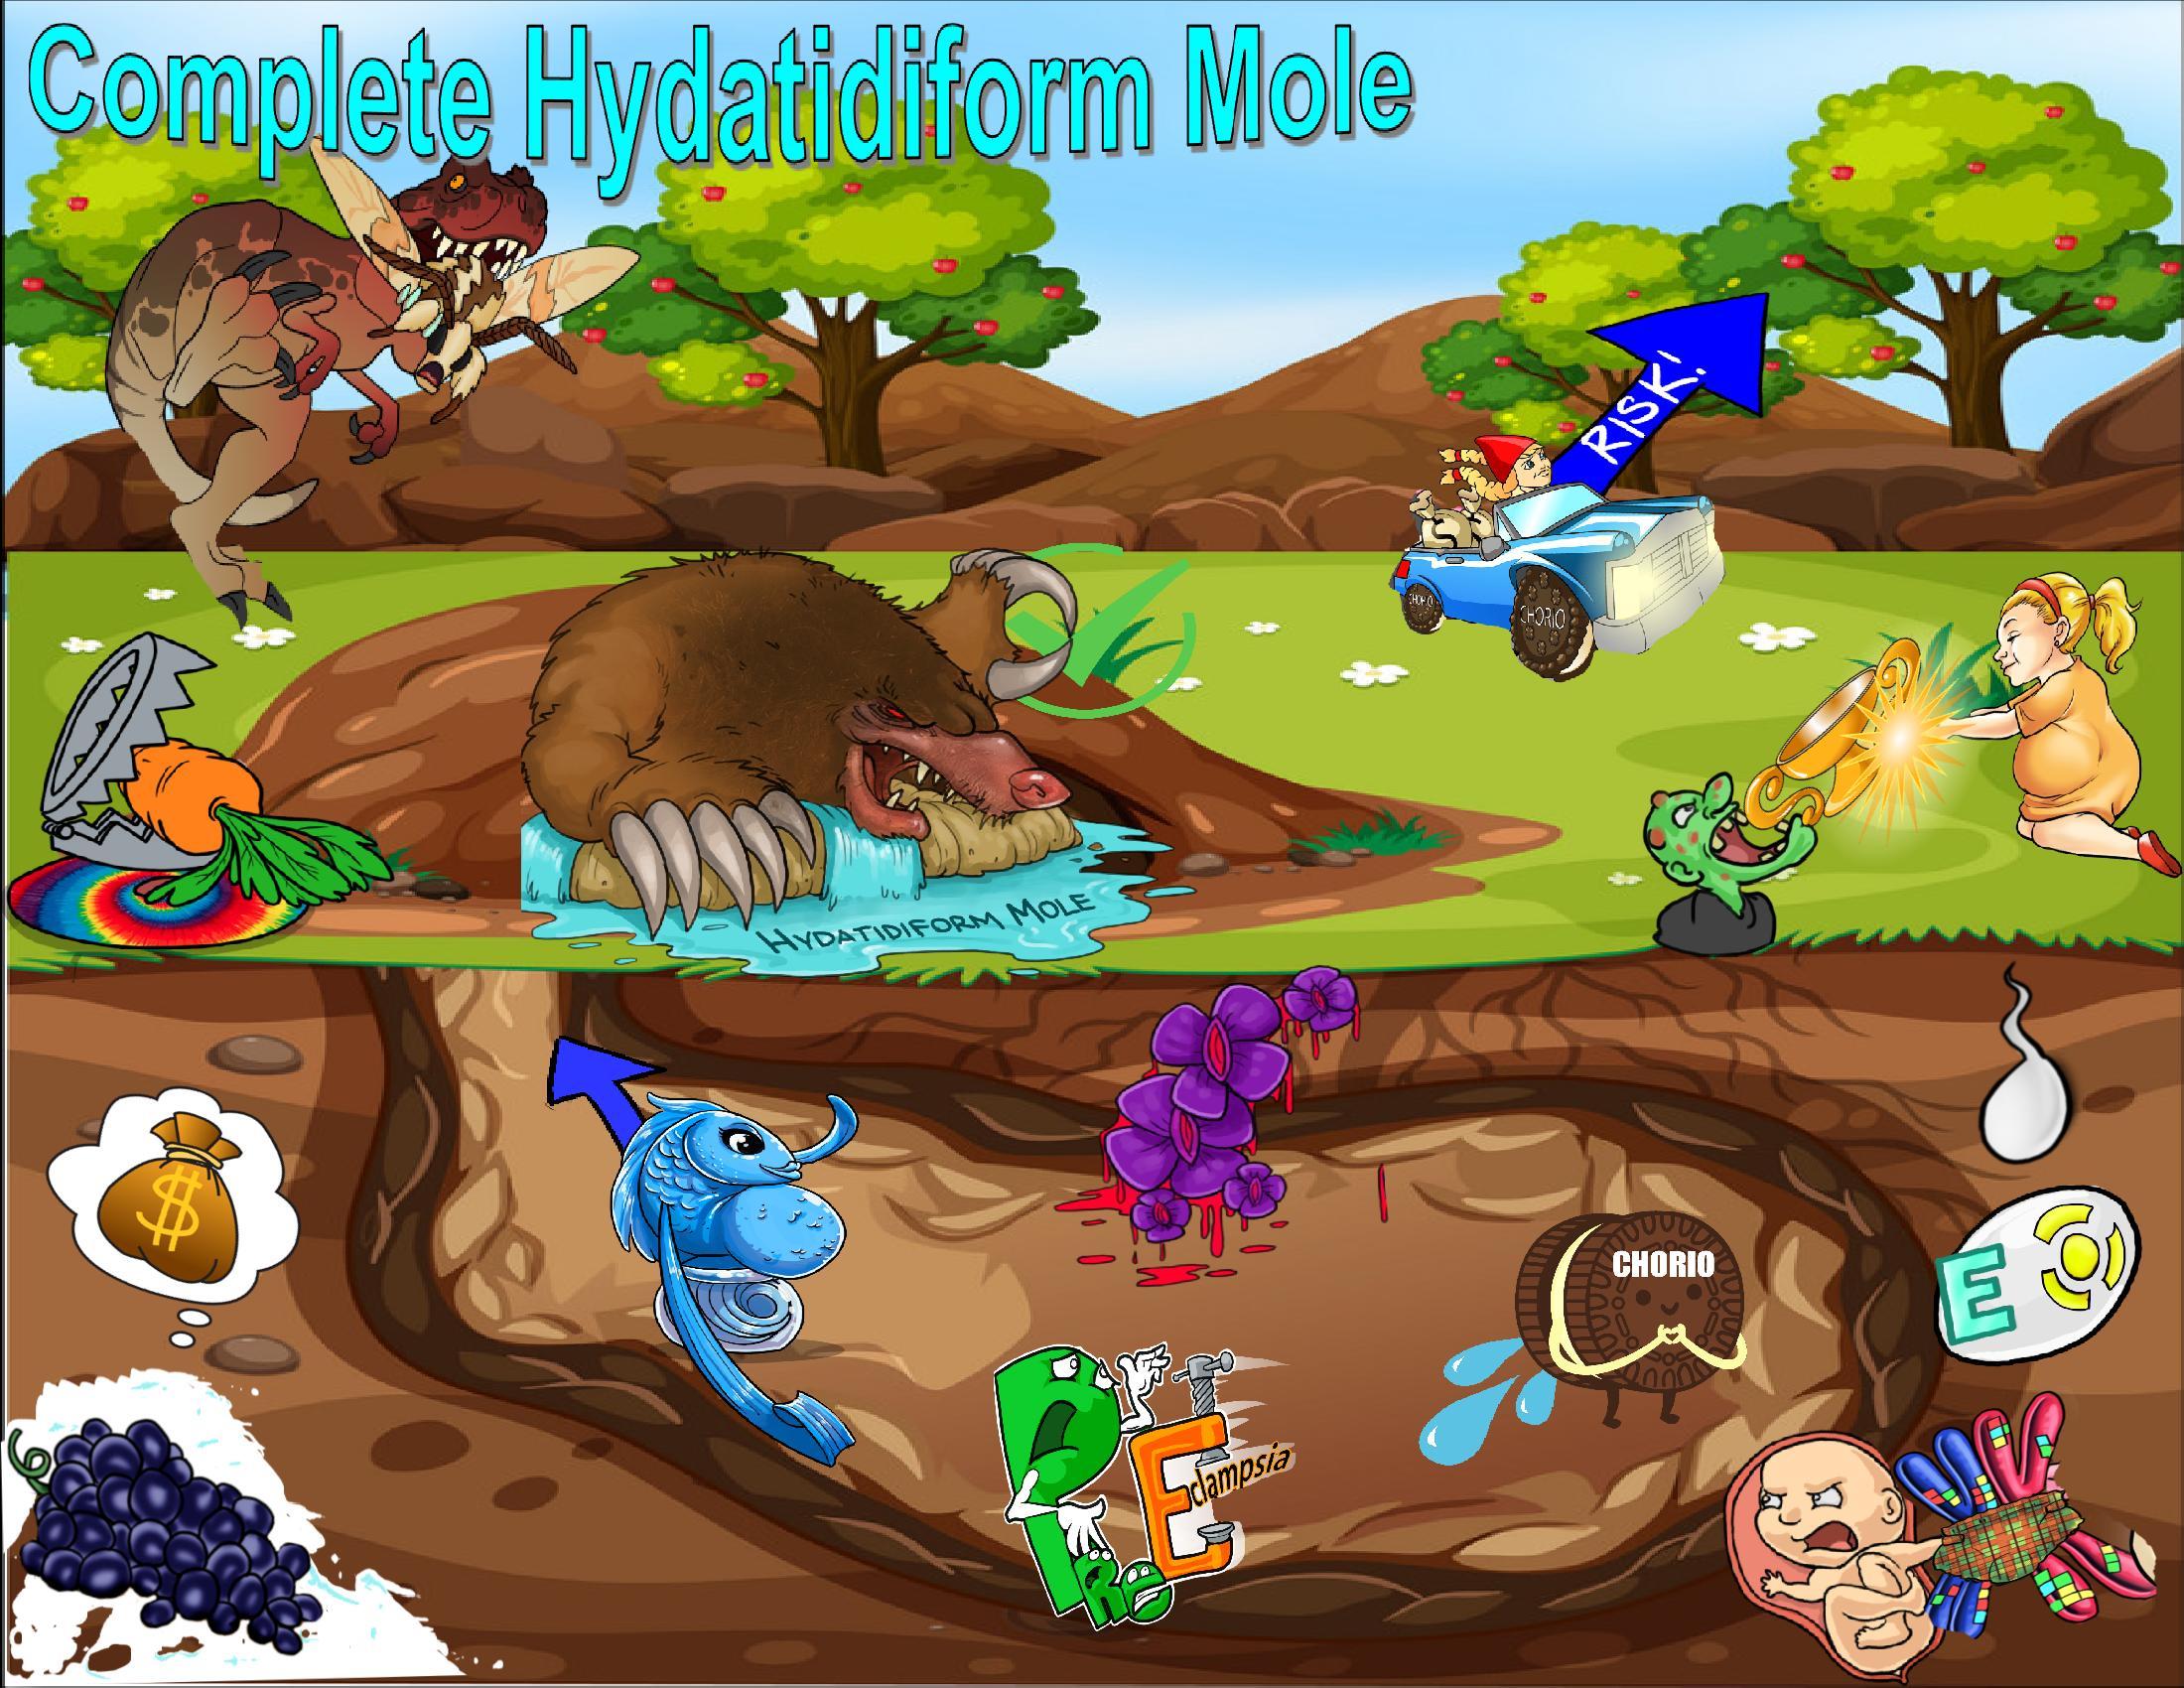 Complete Hydatidiform Mole